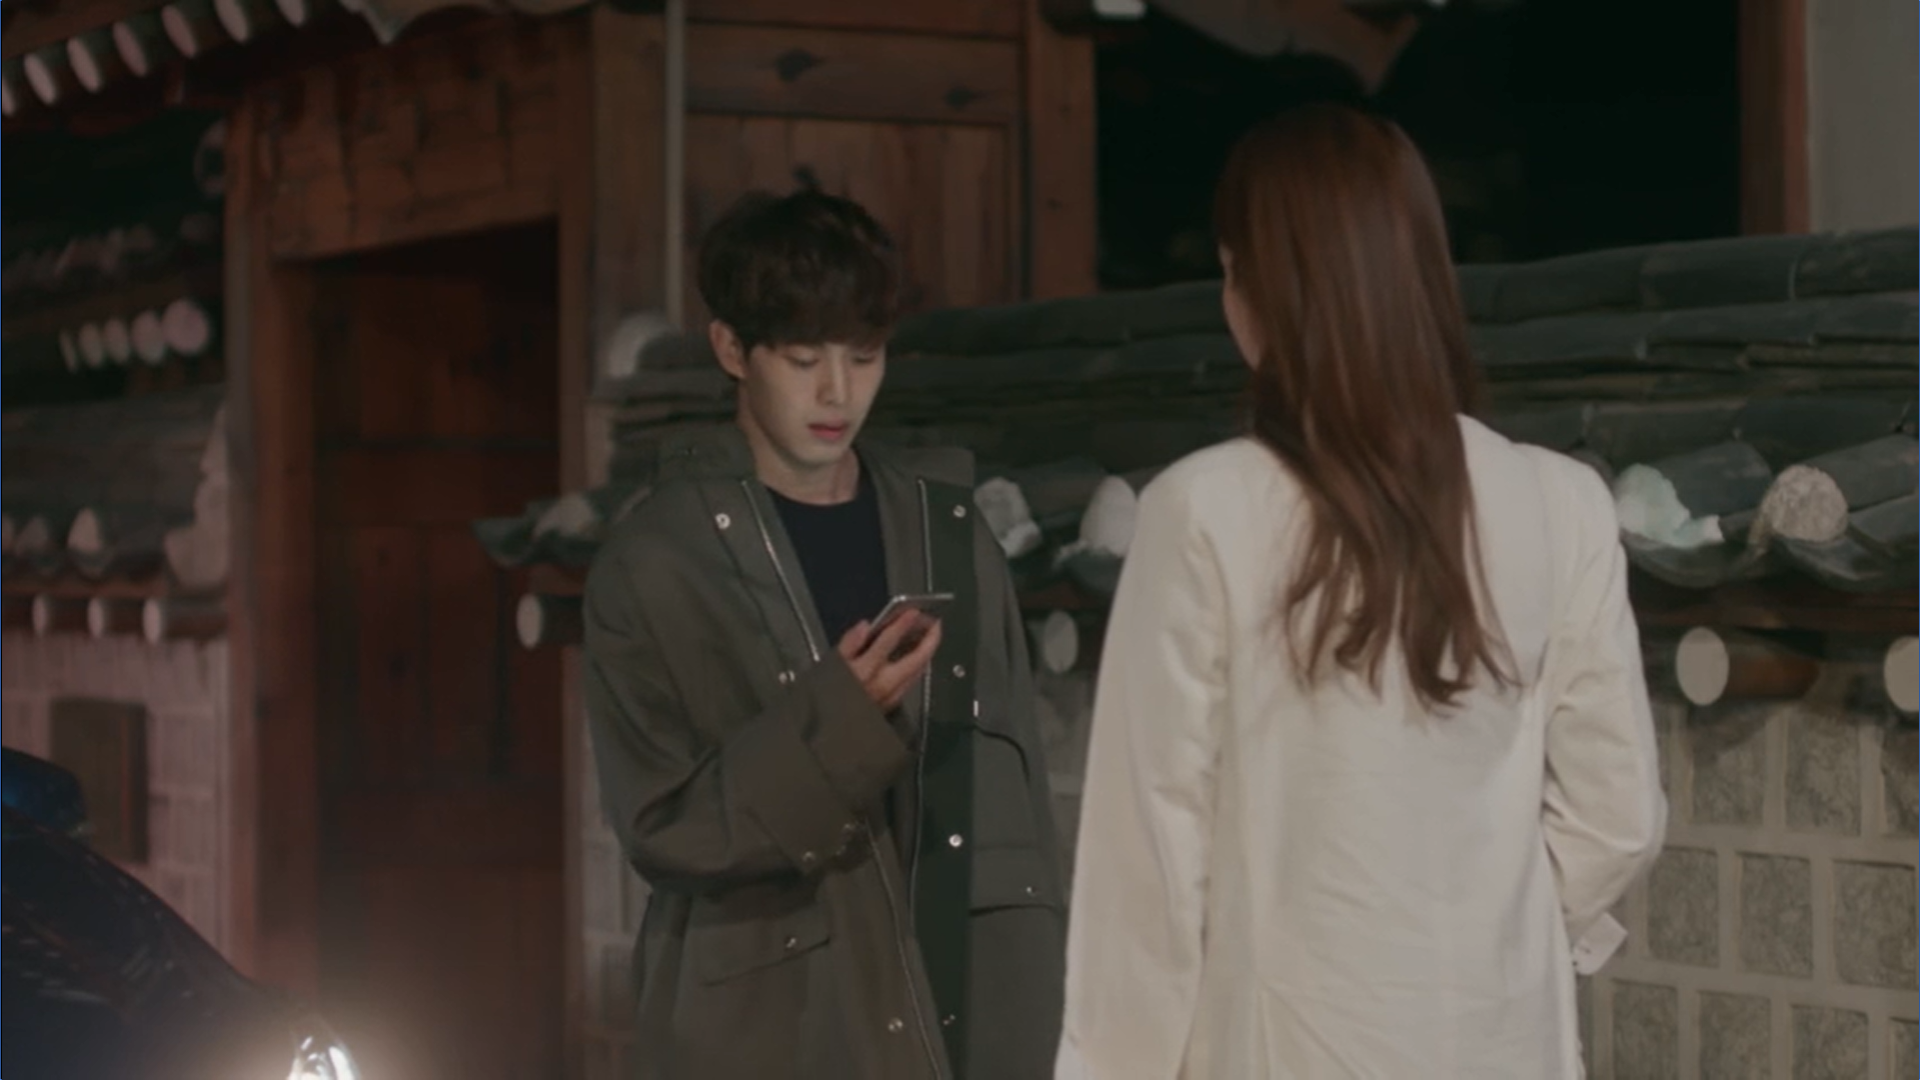 Wednesday 3:30 PM Yoon Jae-won dropping off Gong Na-yeon